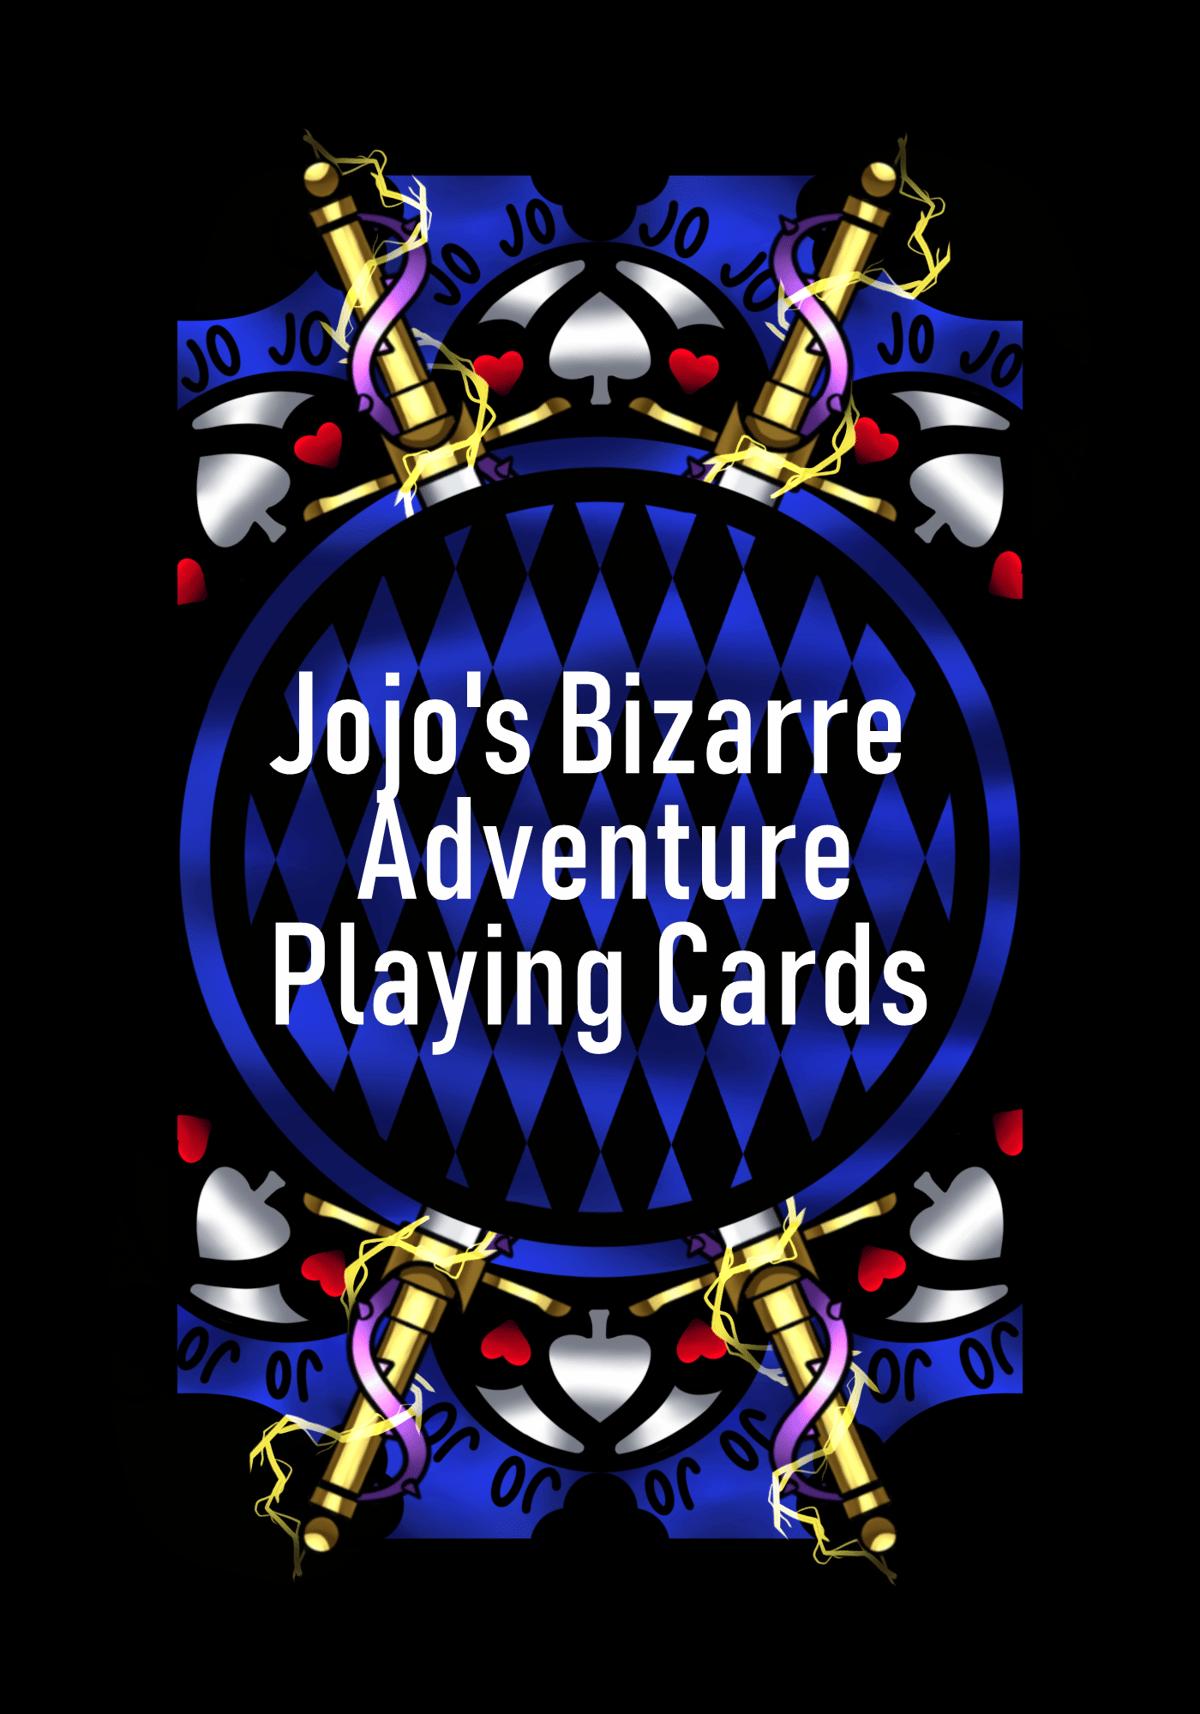 Image of Jojo's Bizarre Adventure Playing Cards